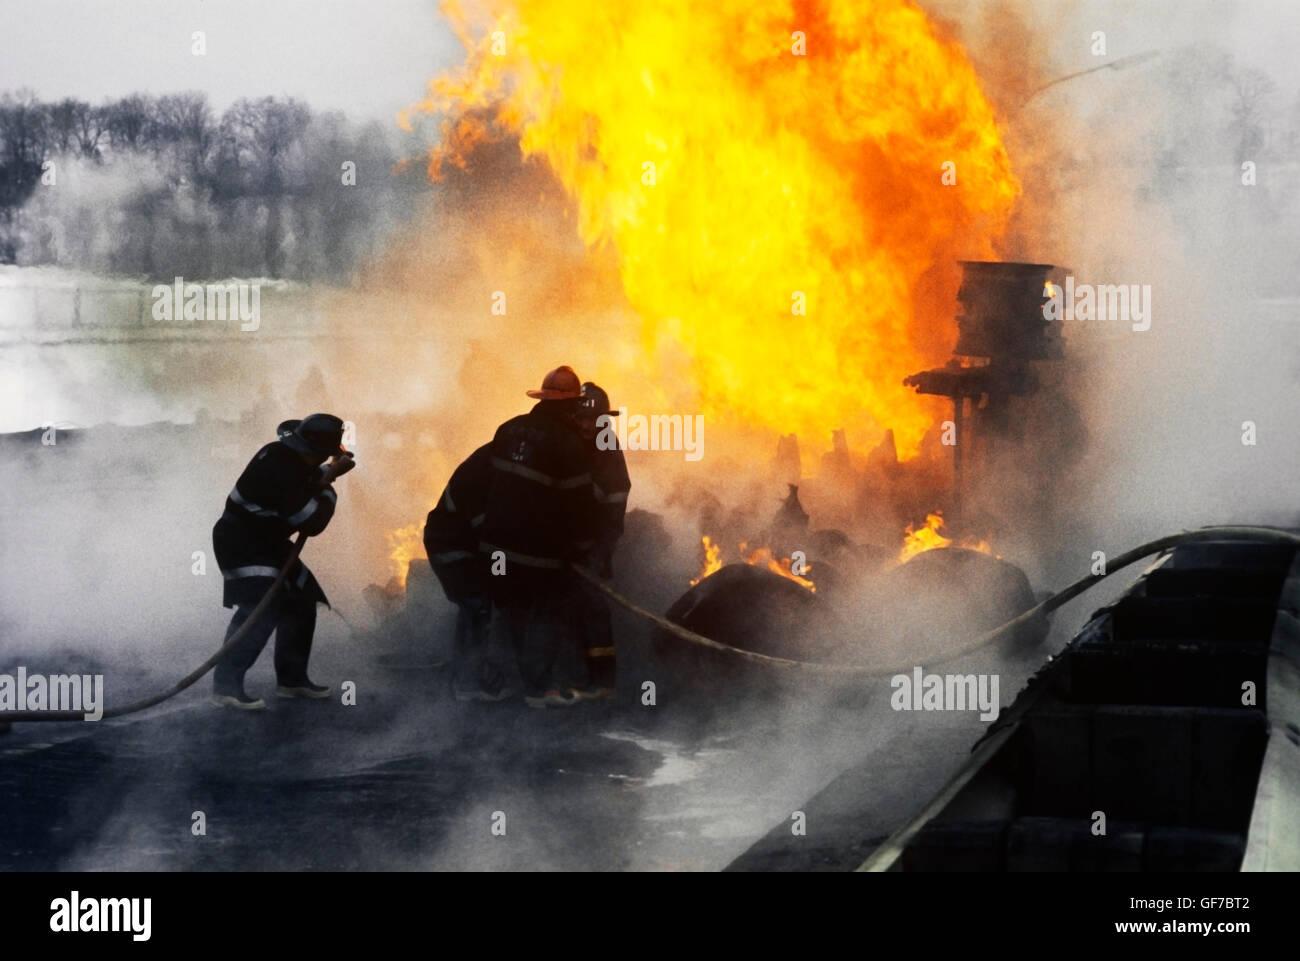 firefighters battle tanker truck fire on highway - Stock Image